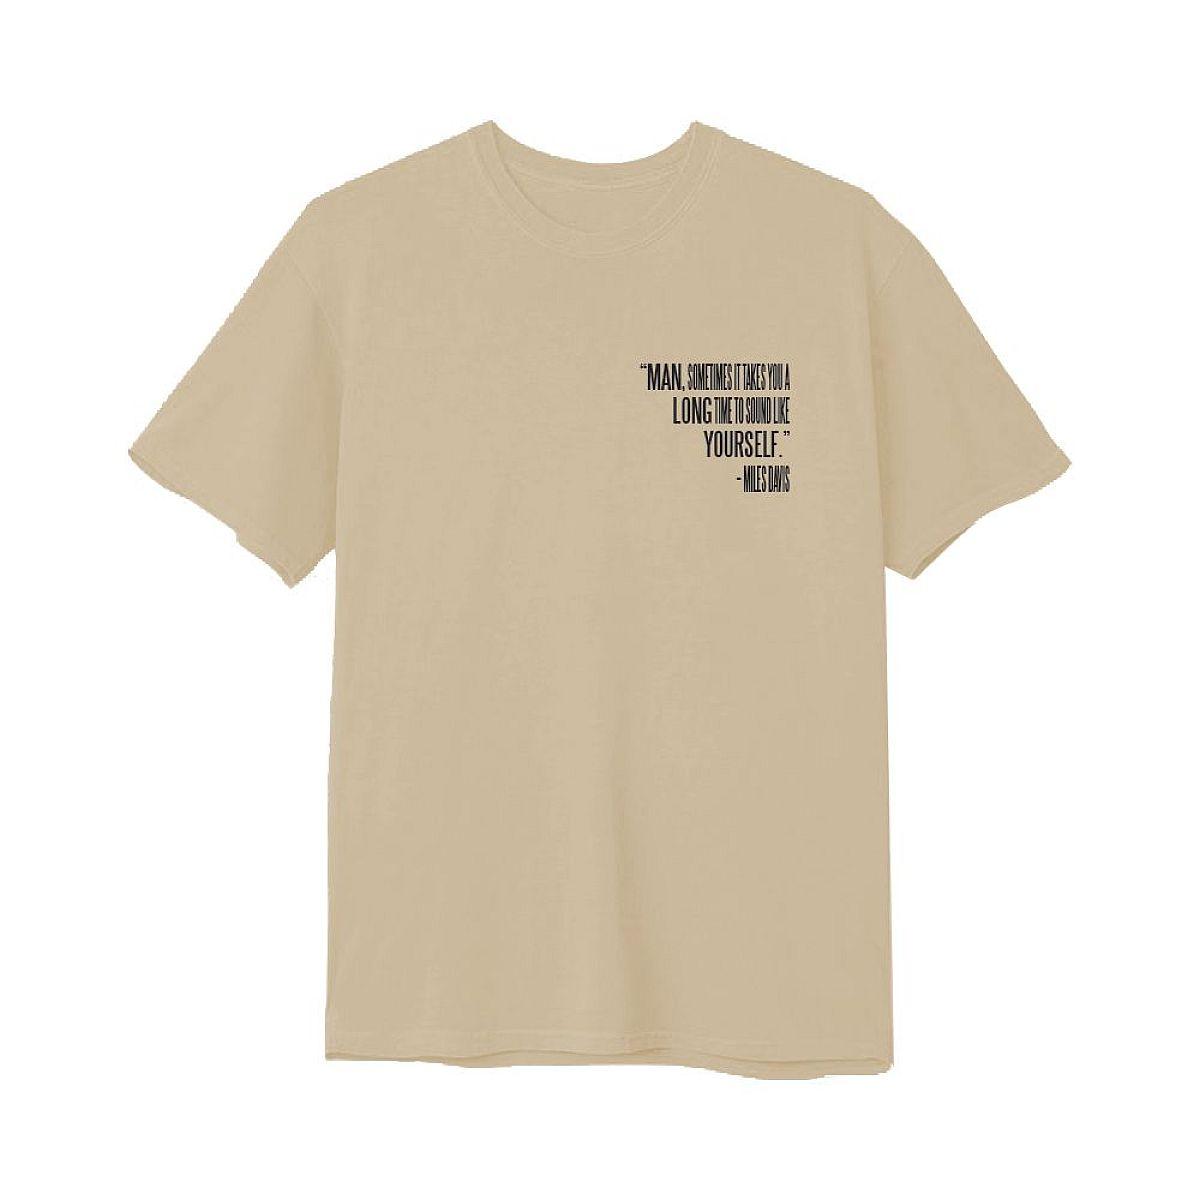 Sound Like Yourself T-Shirt